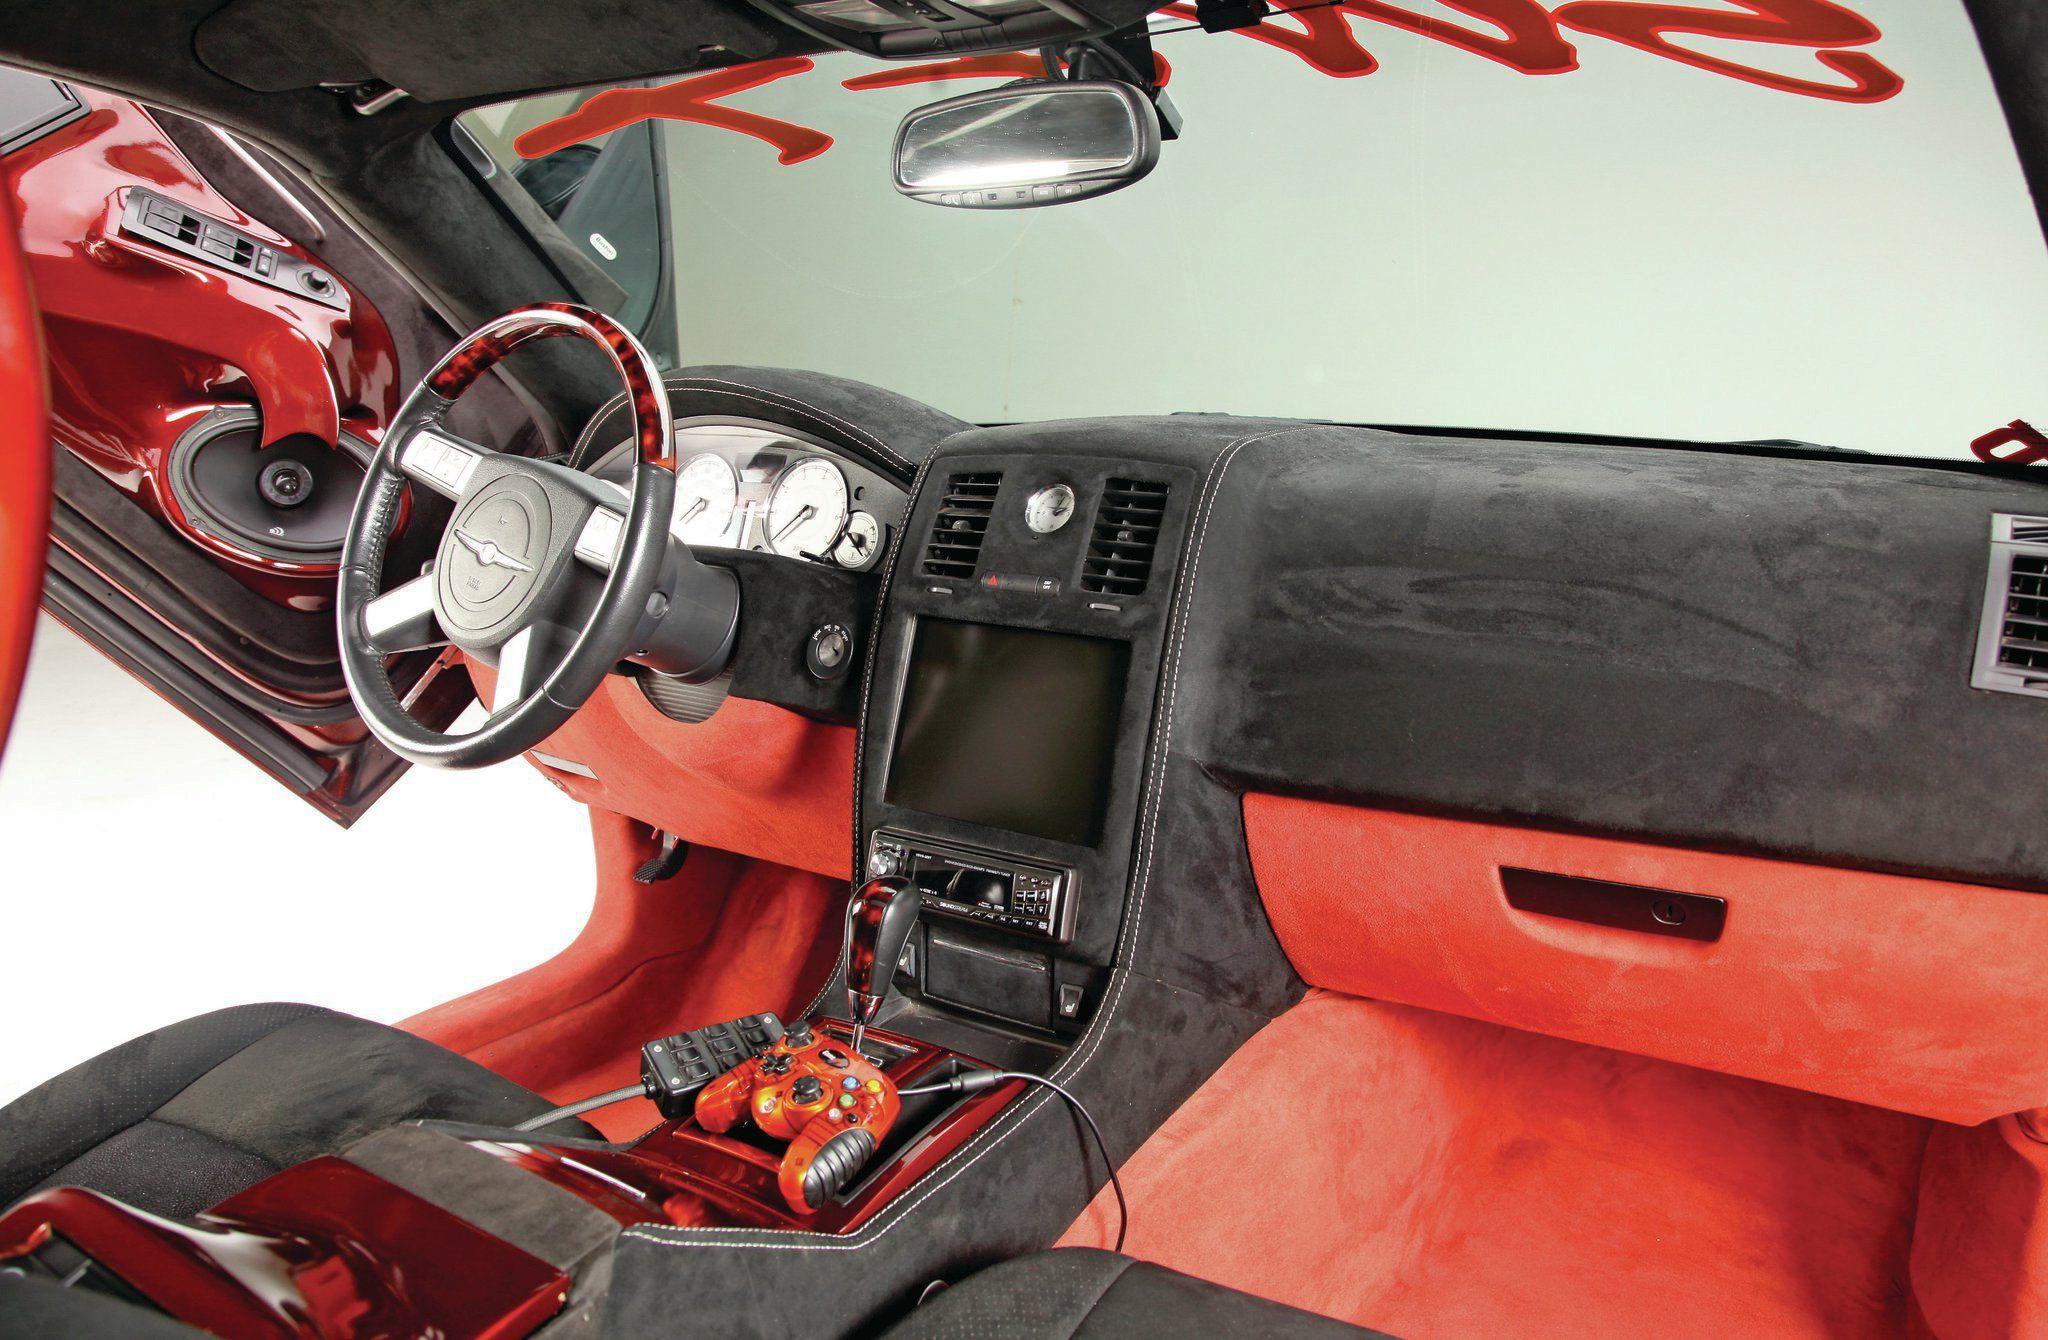 photos interior car interiors accessories chrysler types